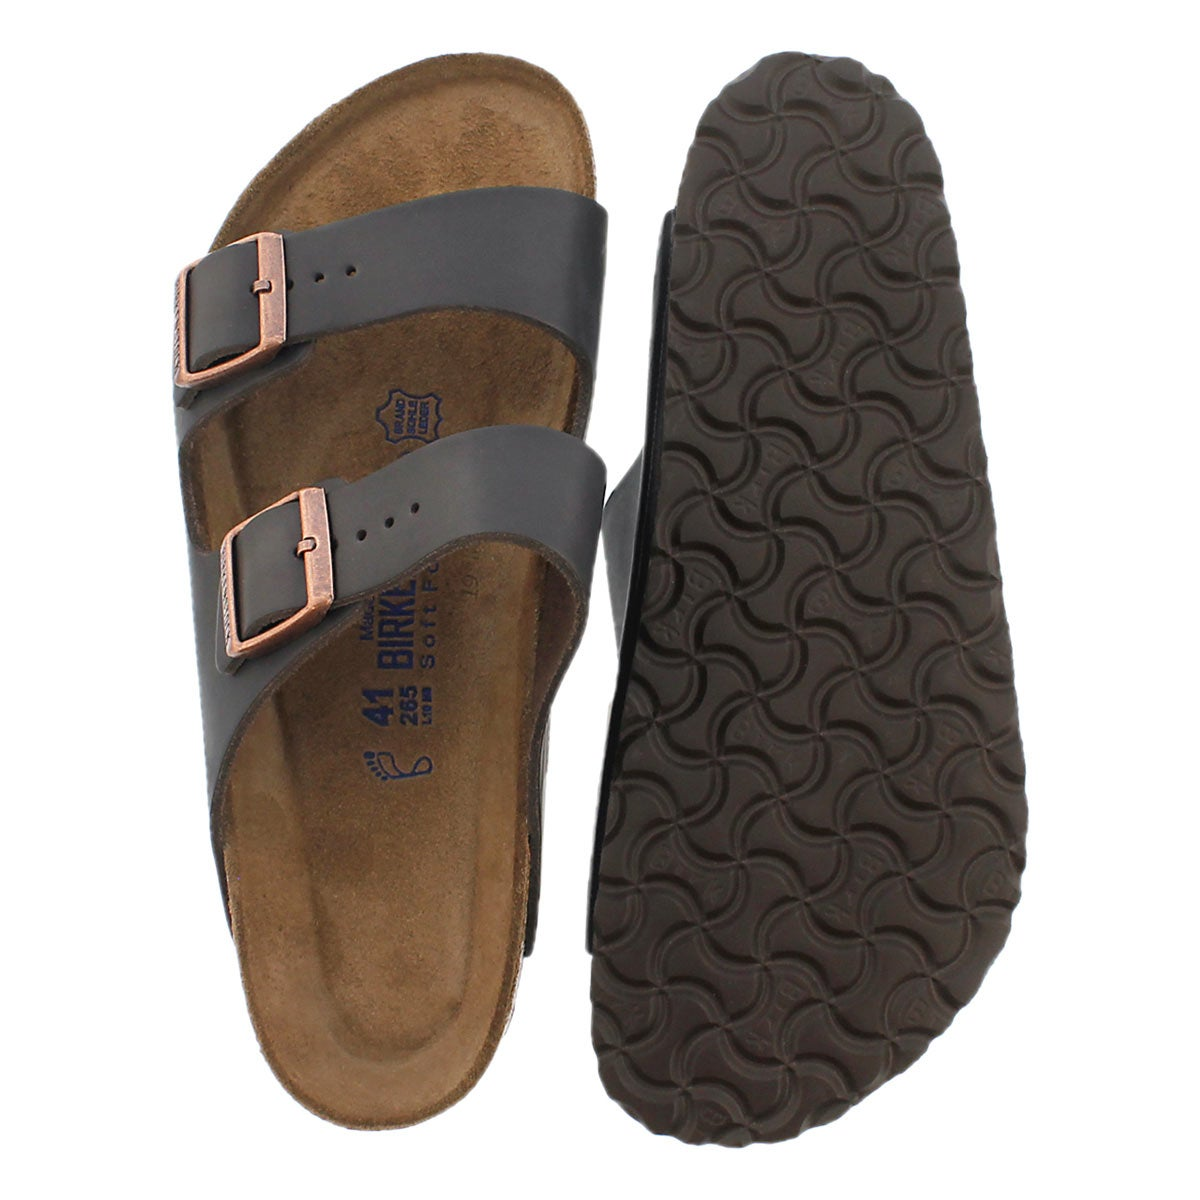 1cd38322c68e0 Men's ARIZONA soft footbed brown 2 strap sandals